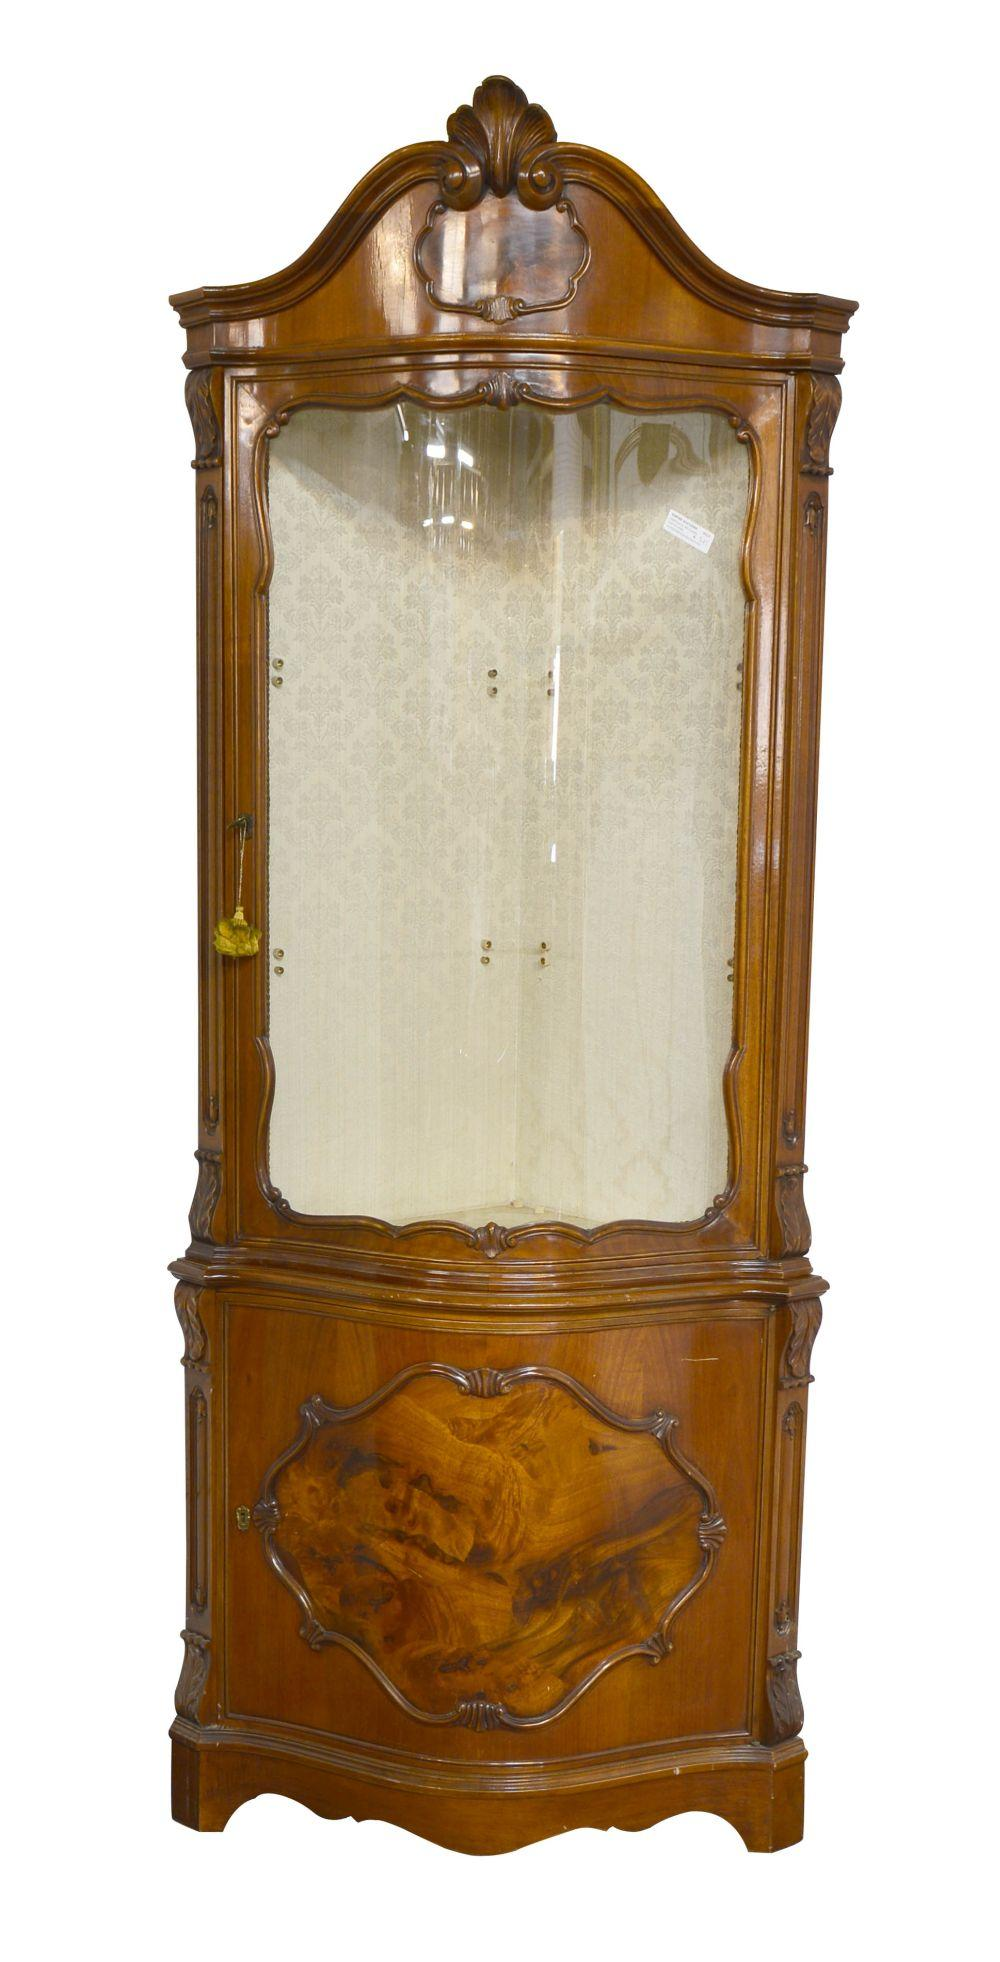 Louis XV-style corner cabinet